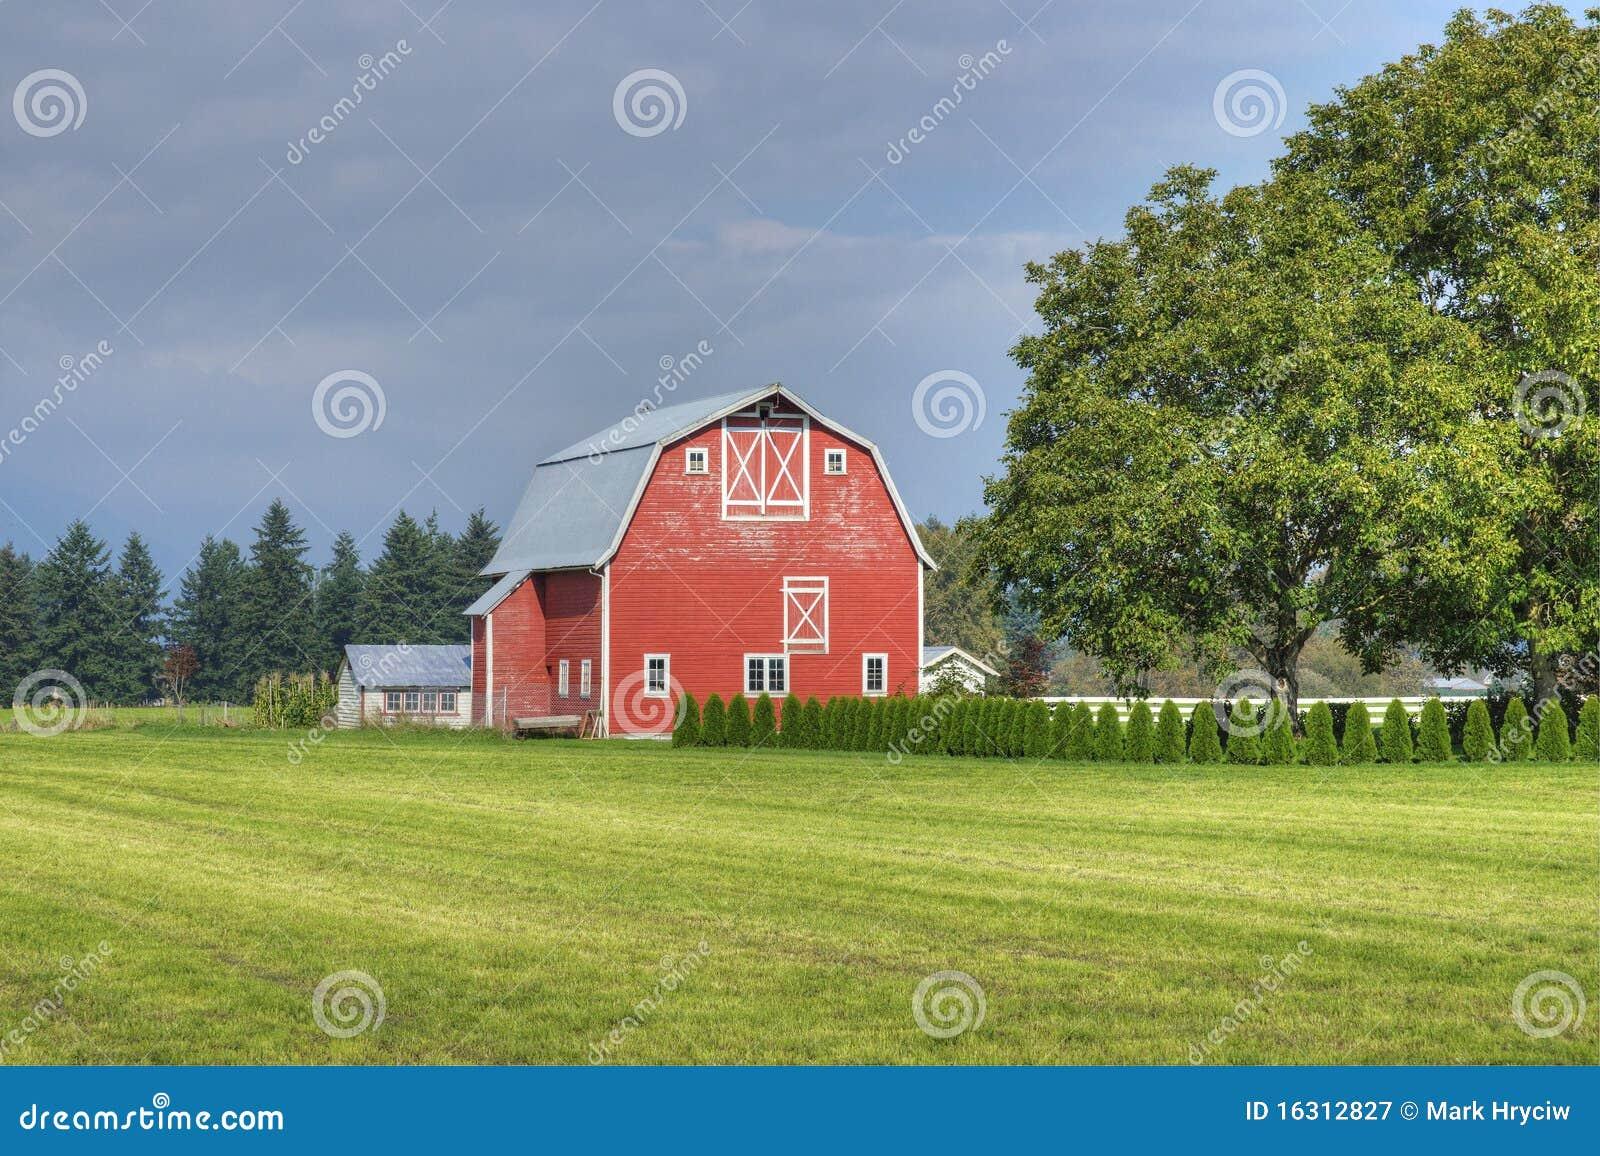 farm country scene stock image image of chilliwack barn 16312827